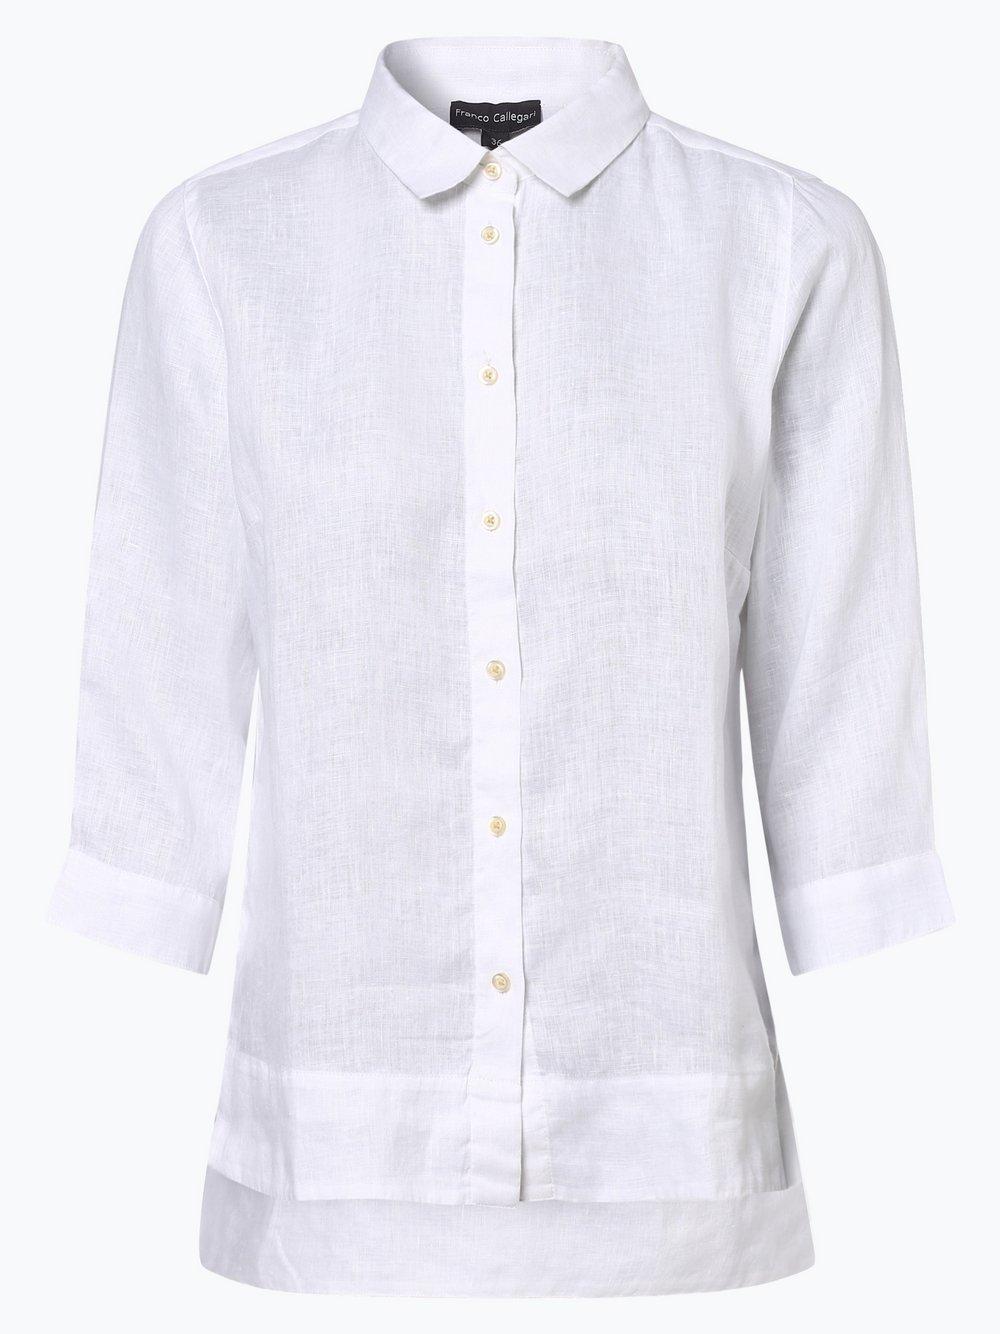 Franco Callegari - Bluzka damska z lnu, biały